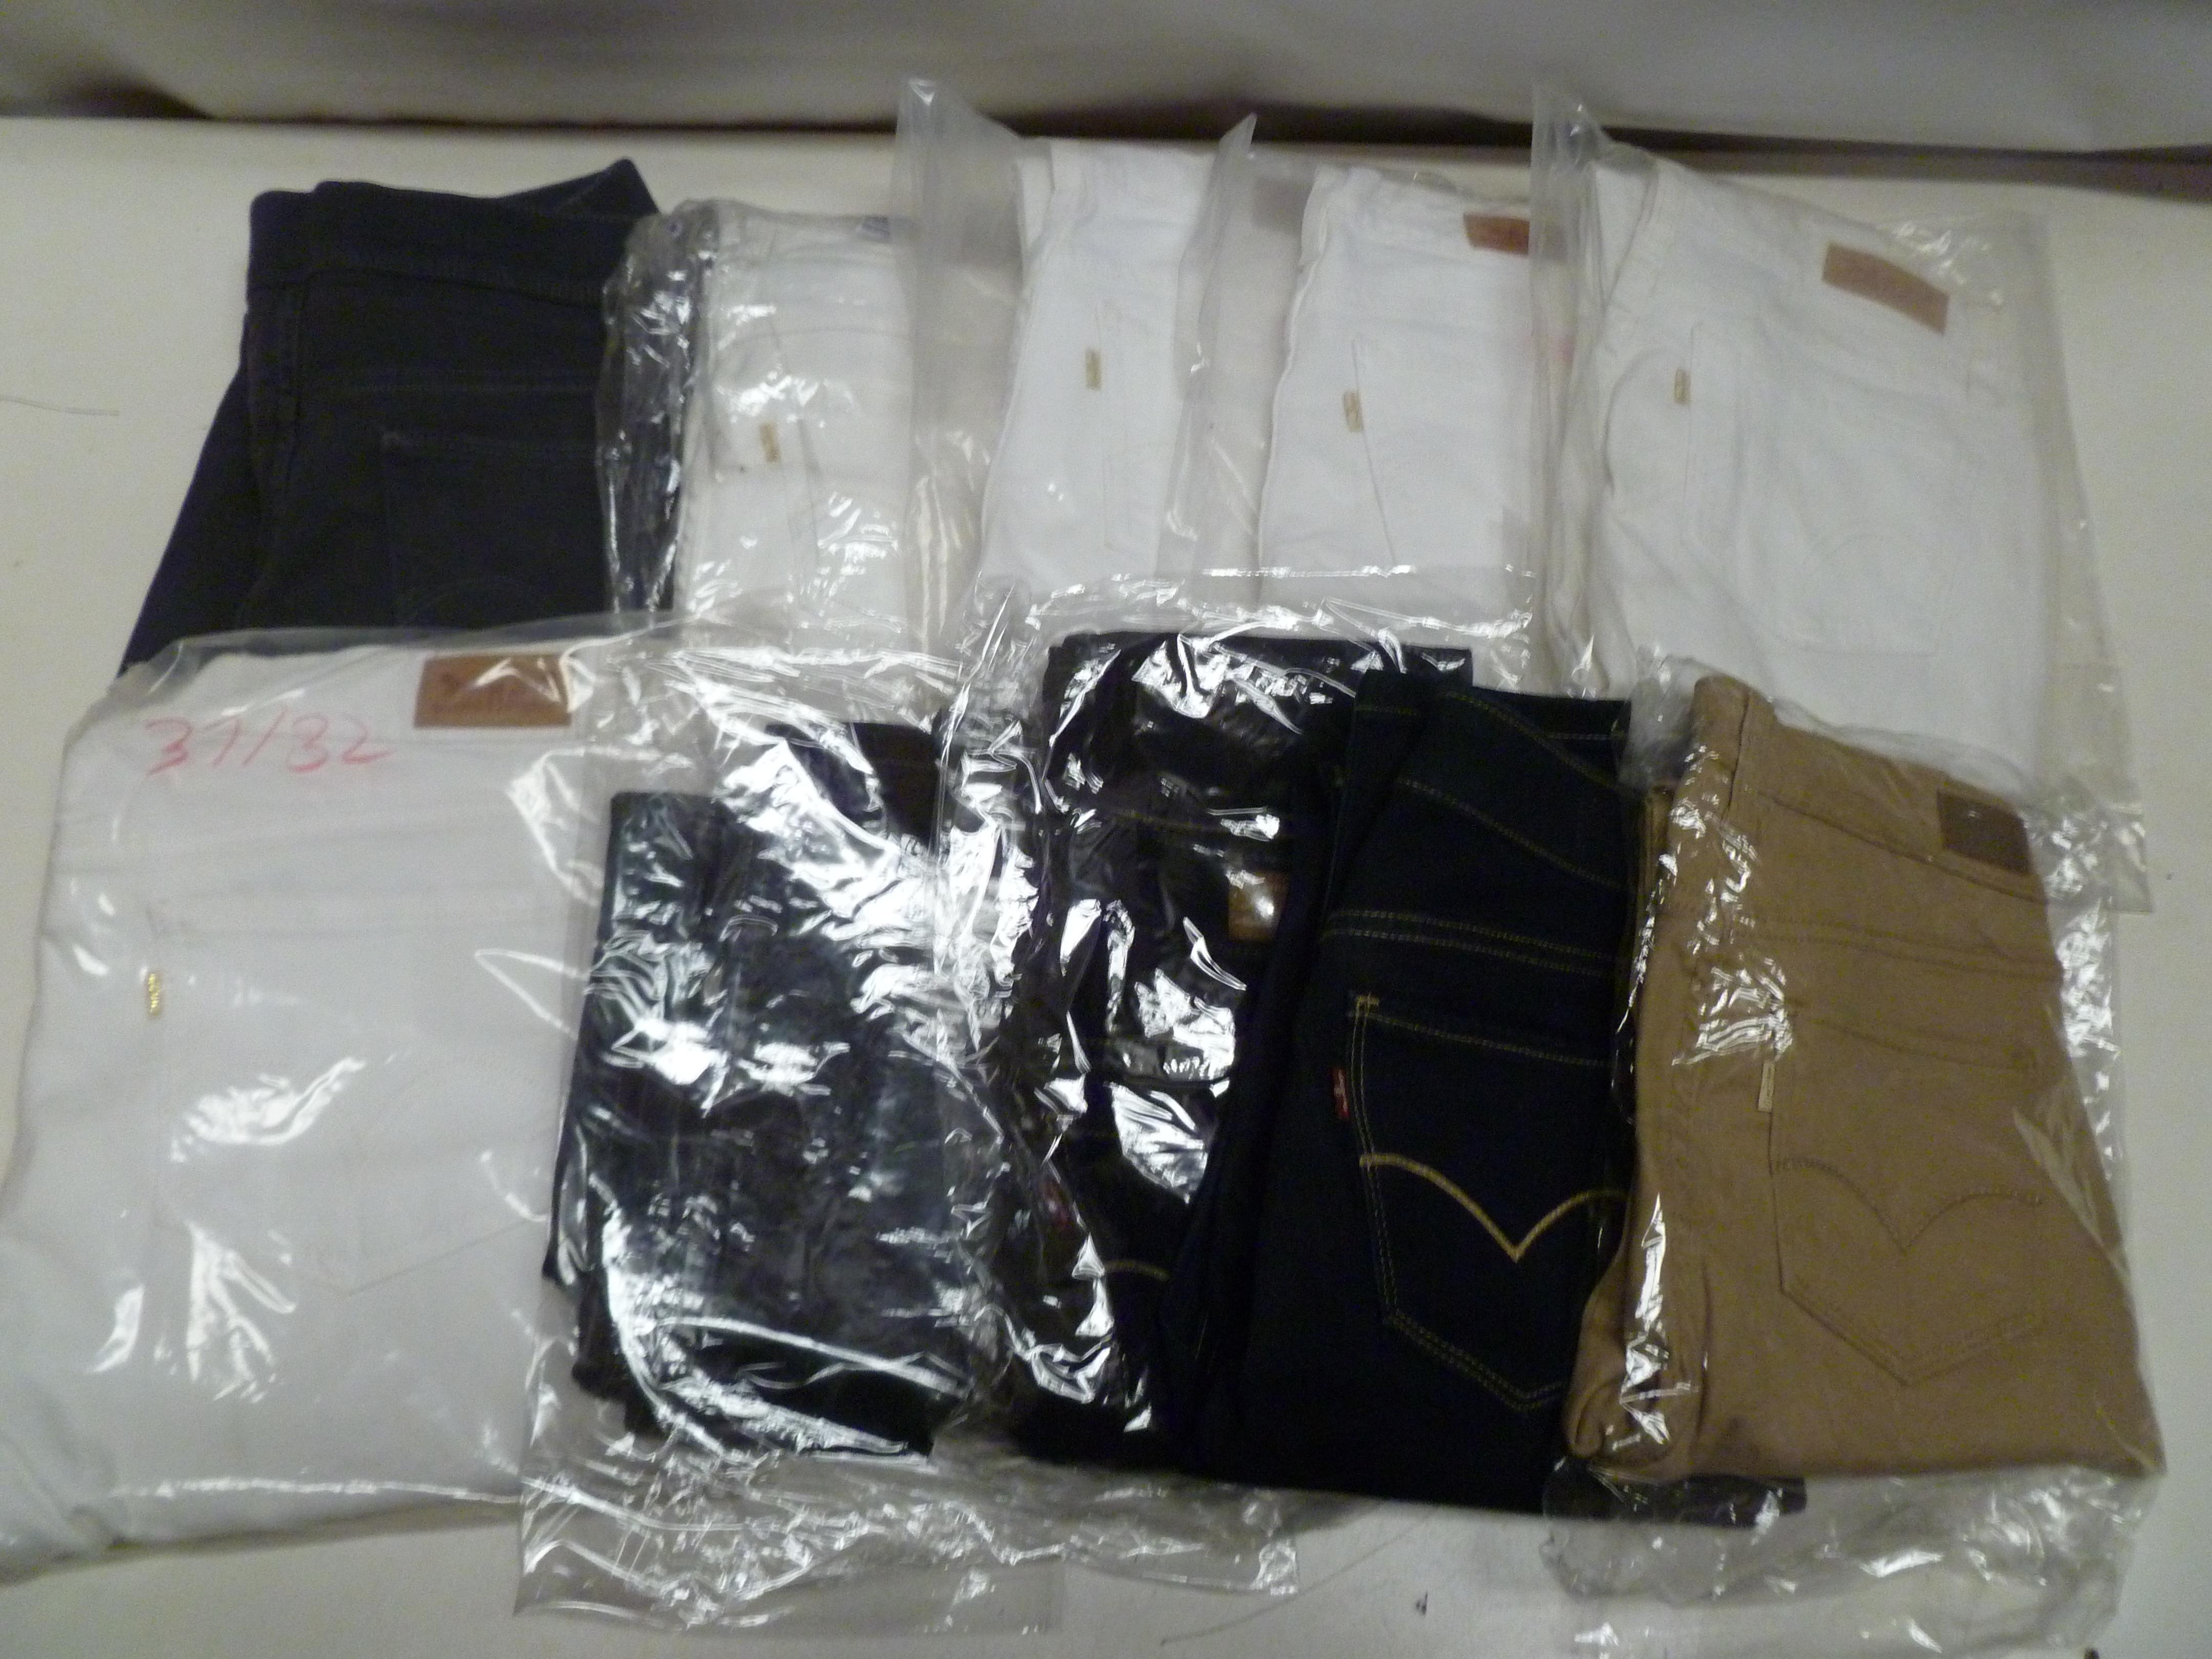 10 x Levi jeans All New ladies jeans mixed sizes all Levis Bulk Job Lot Wholesale Lot 3